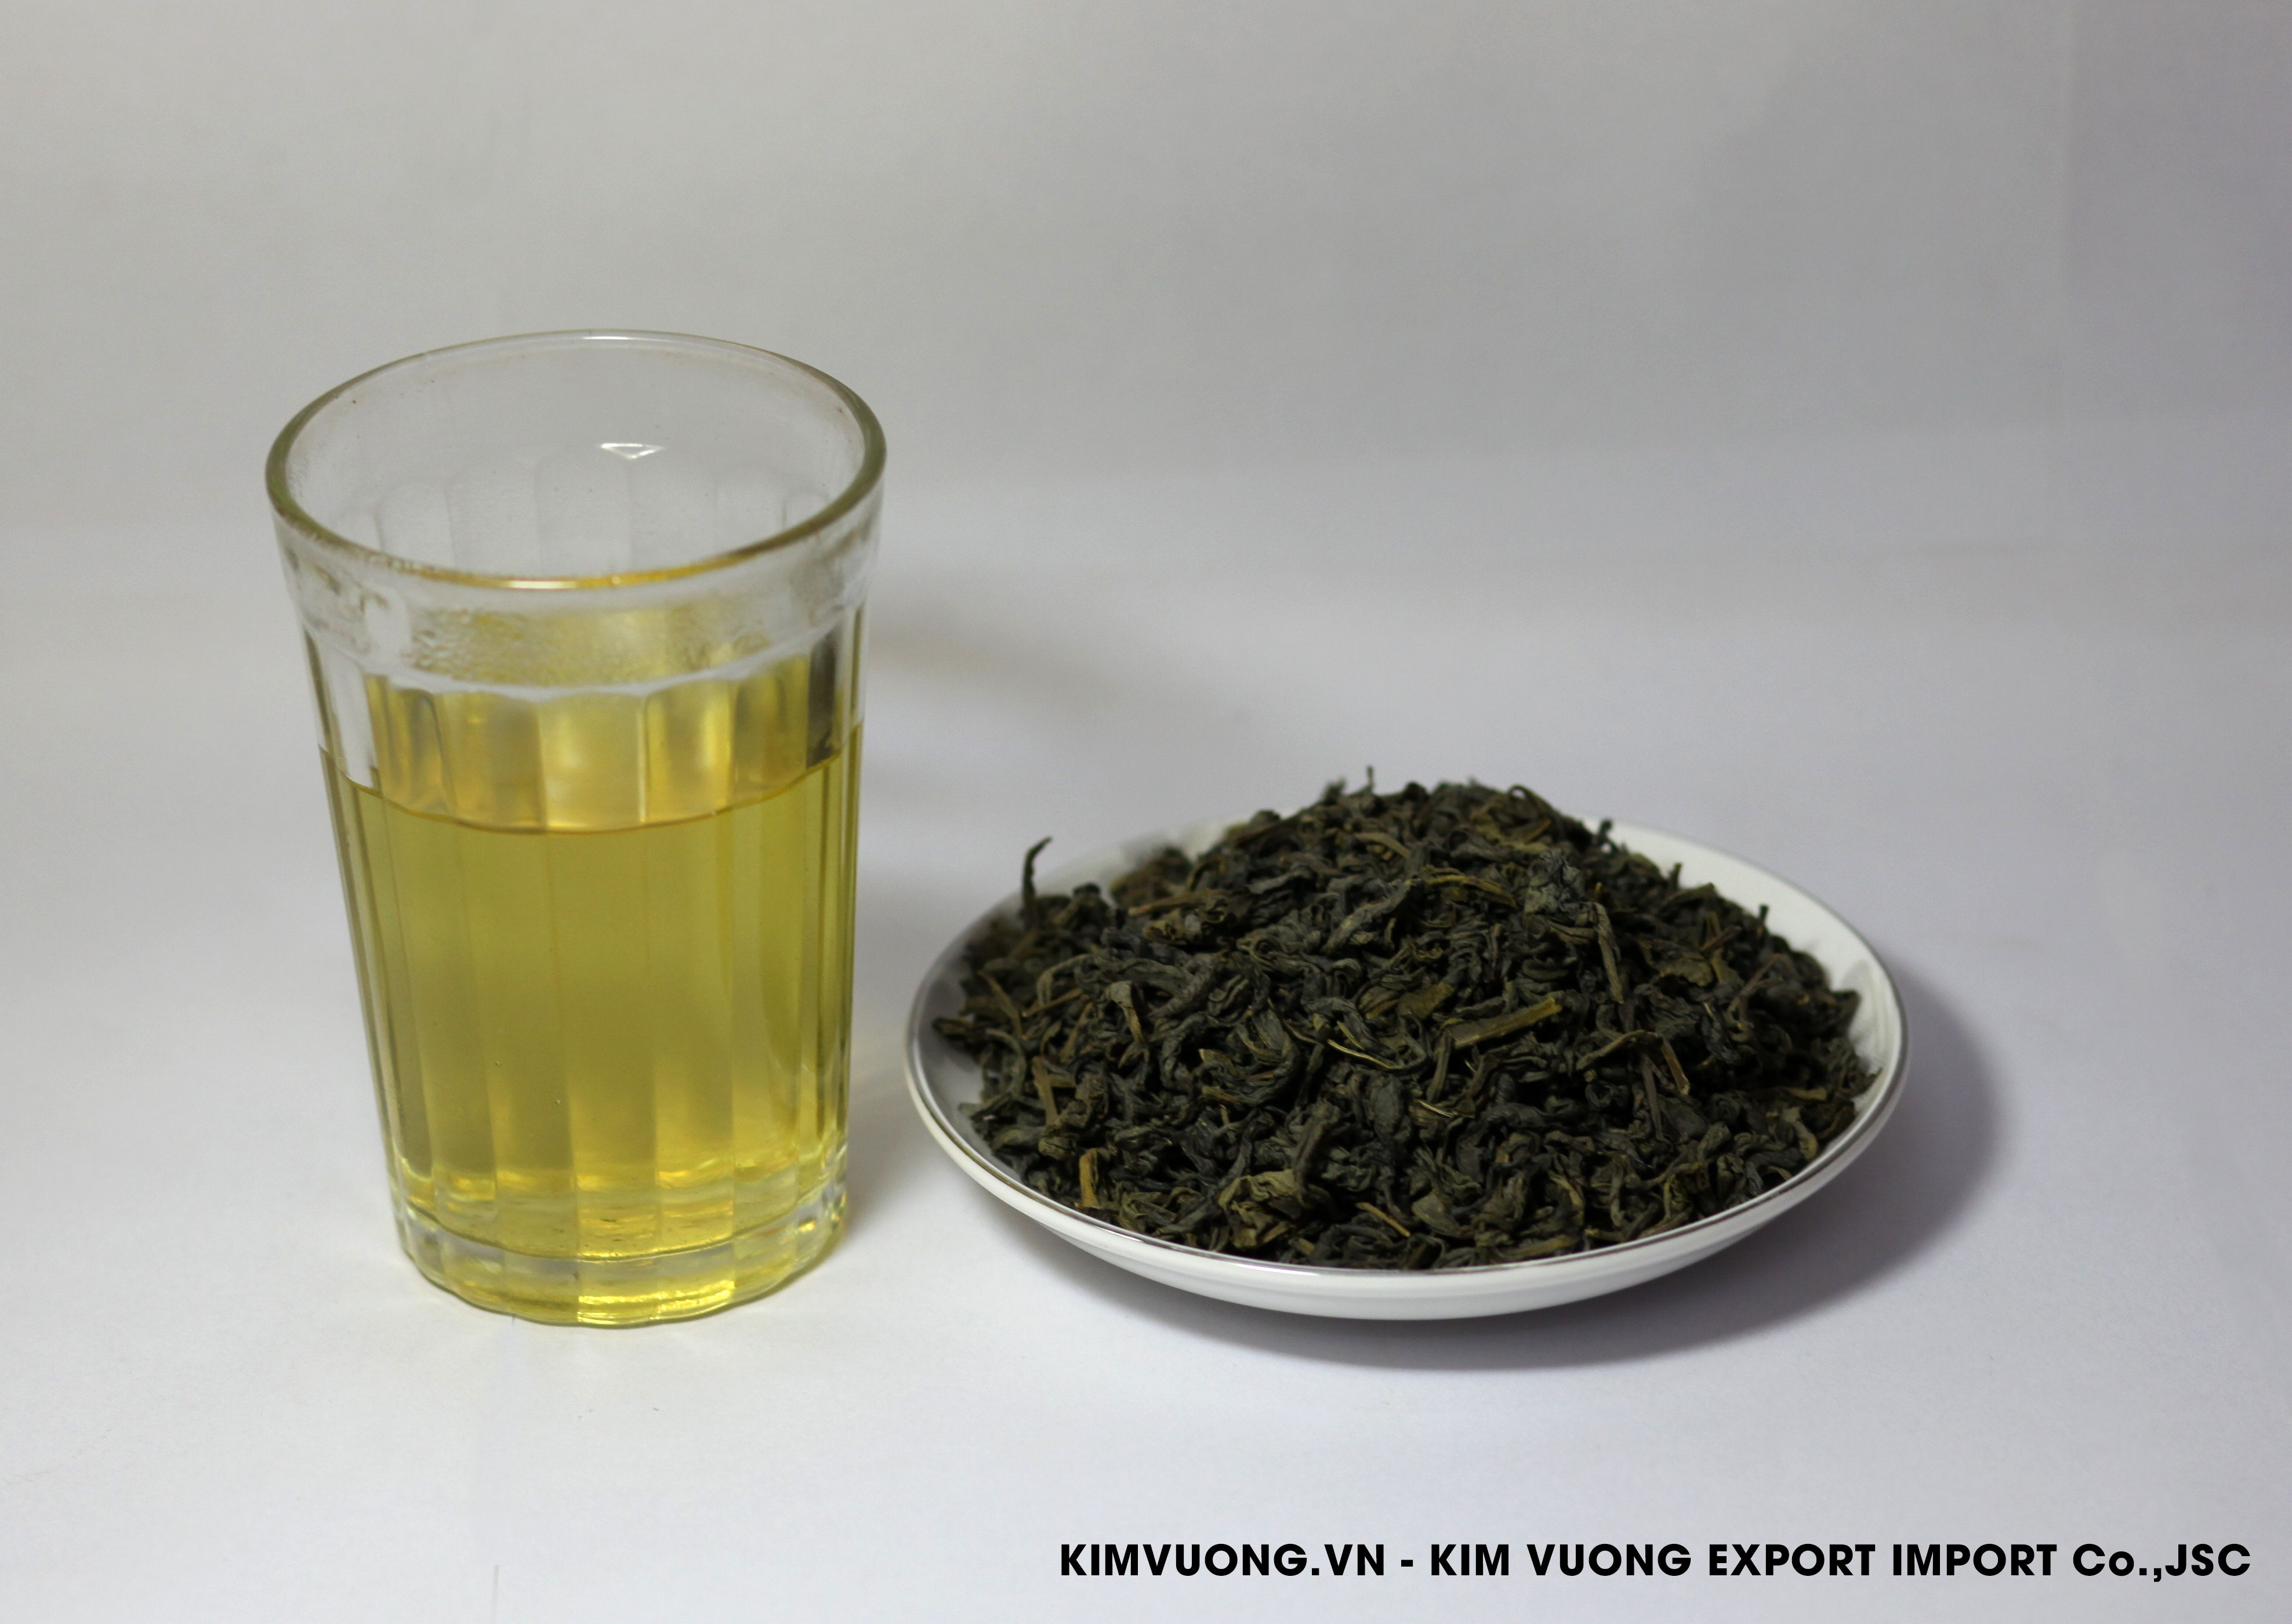 Green tea OP 595  - KIM VUONG EXPORT IMPORT Co.,JSC